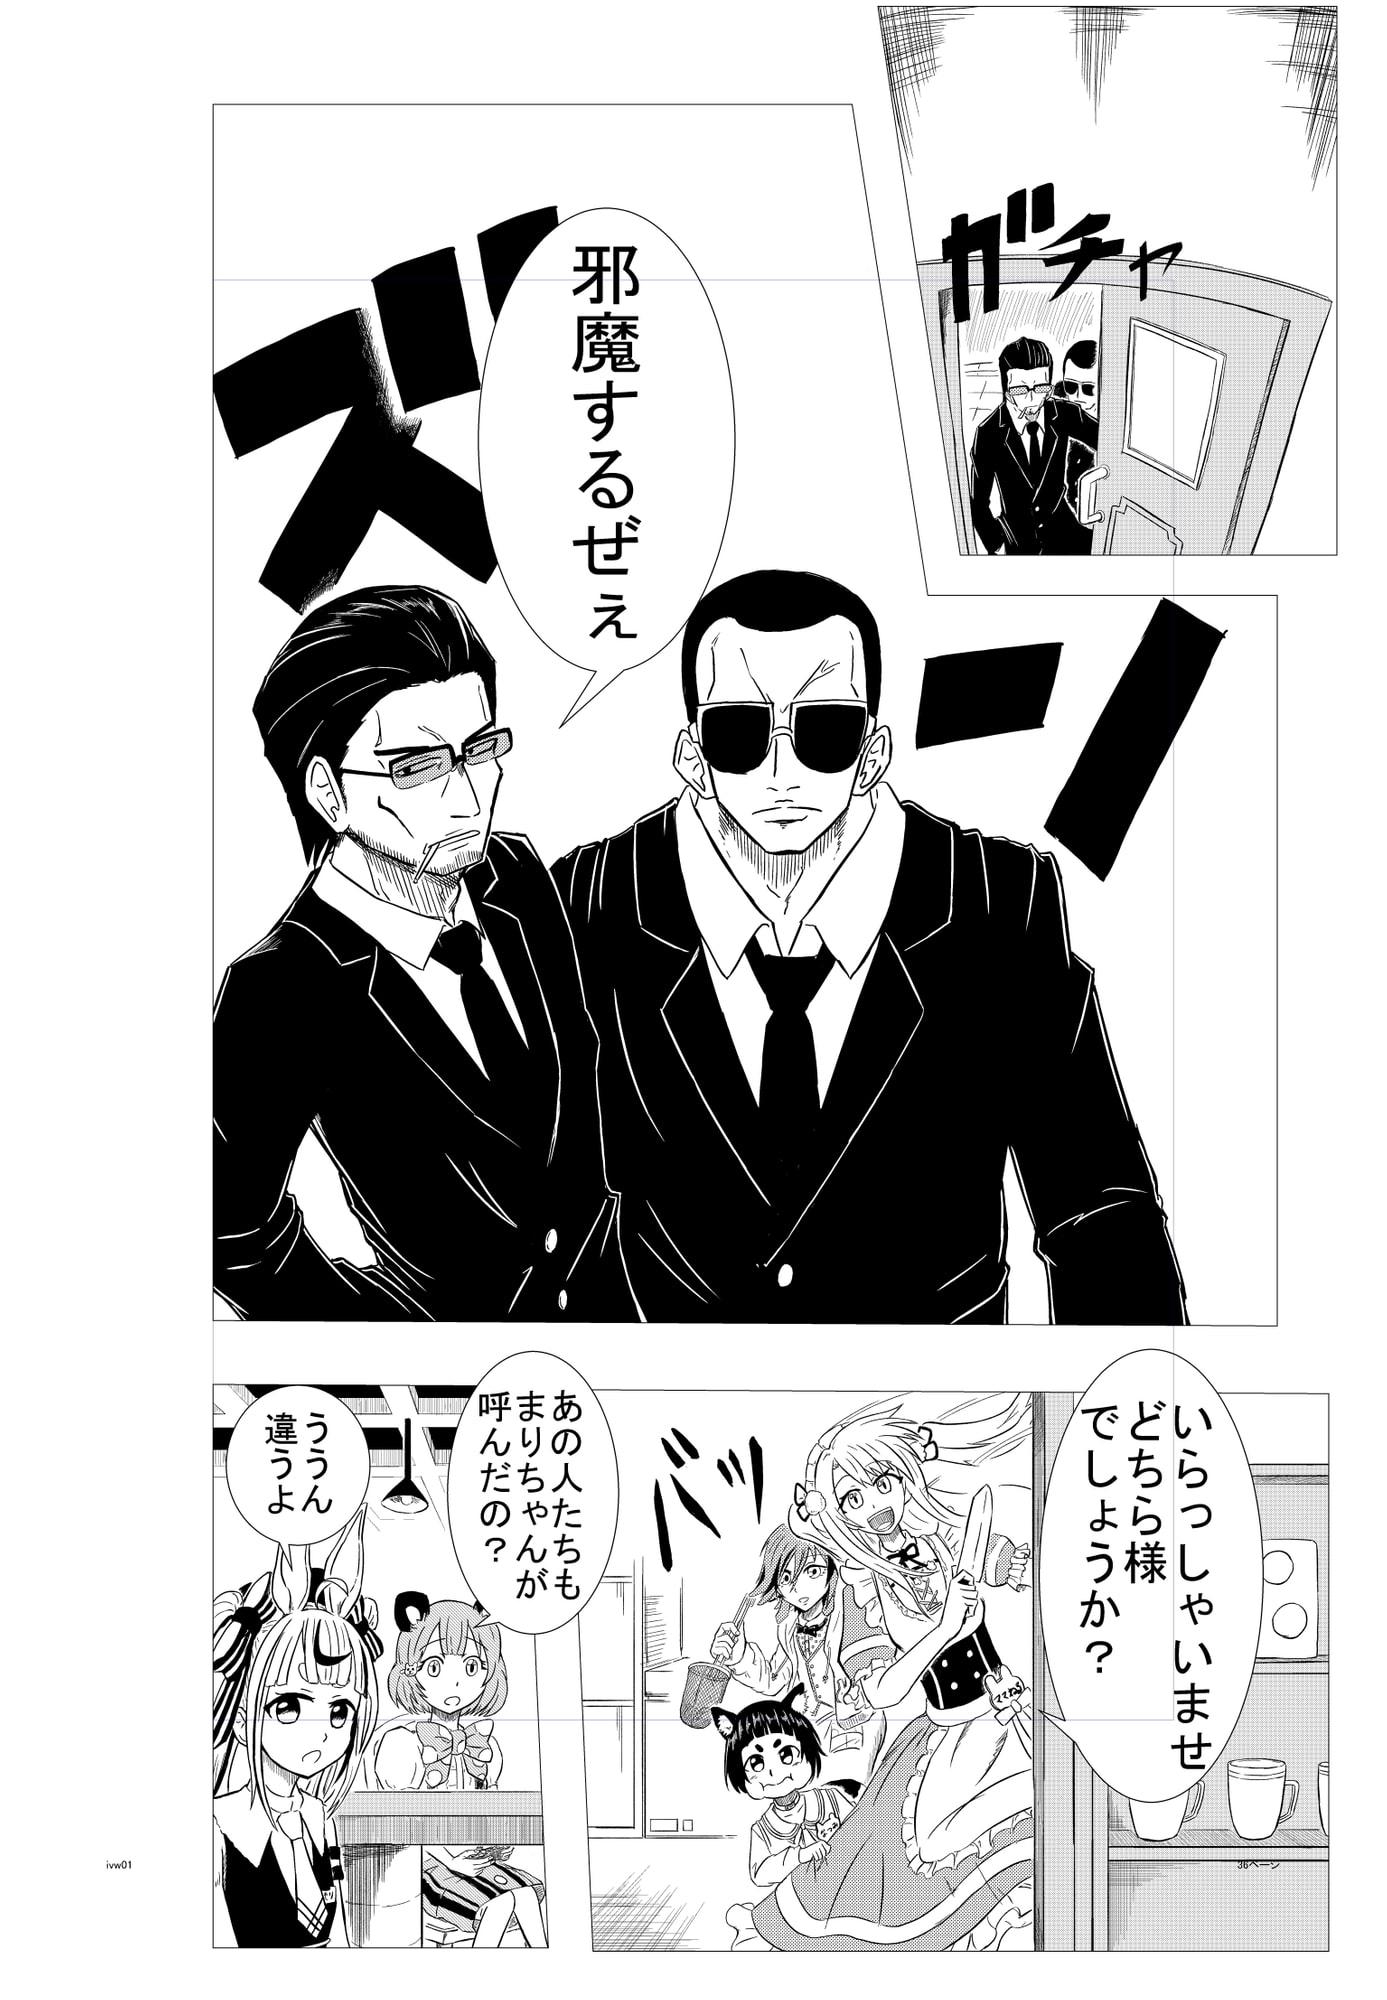 IF VERTIAL WORLD 一日店長ママねる